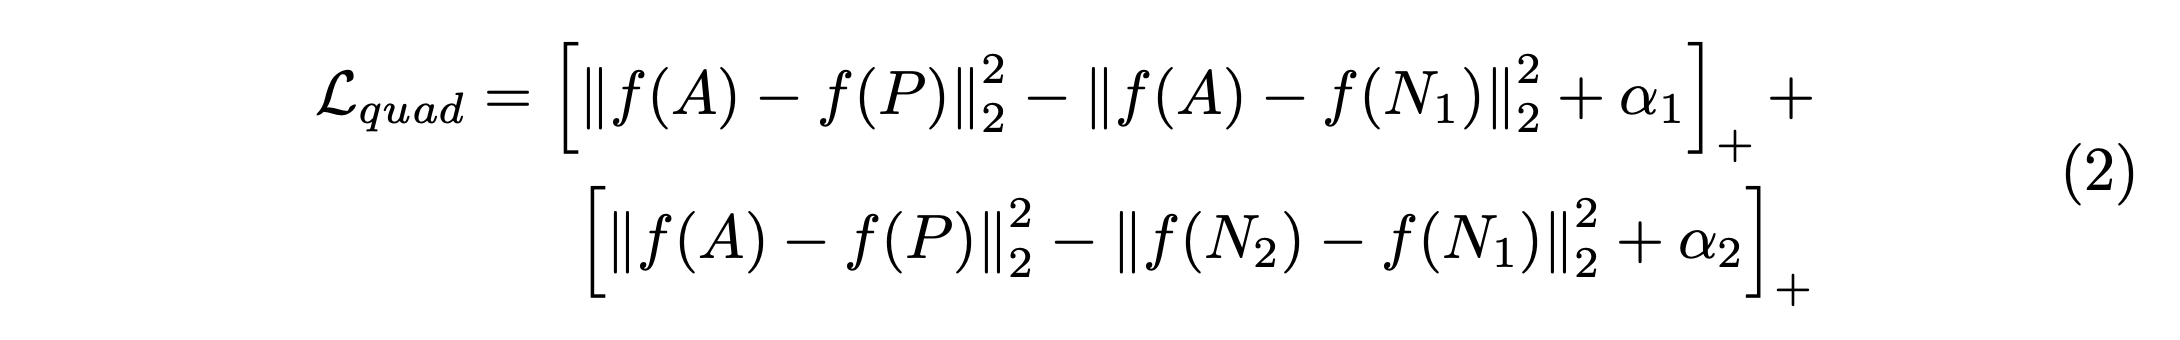 Quadruplet loss function